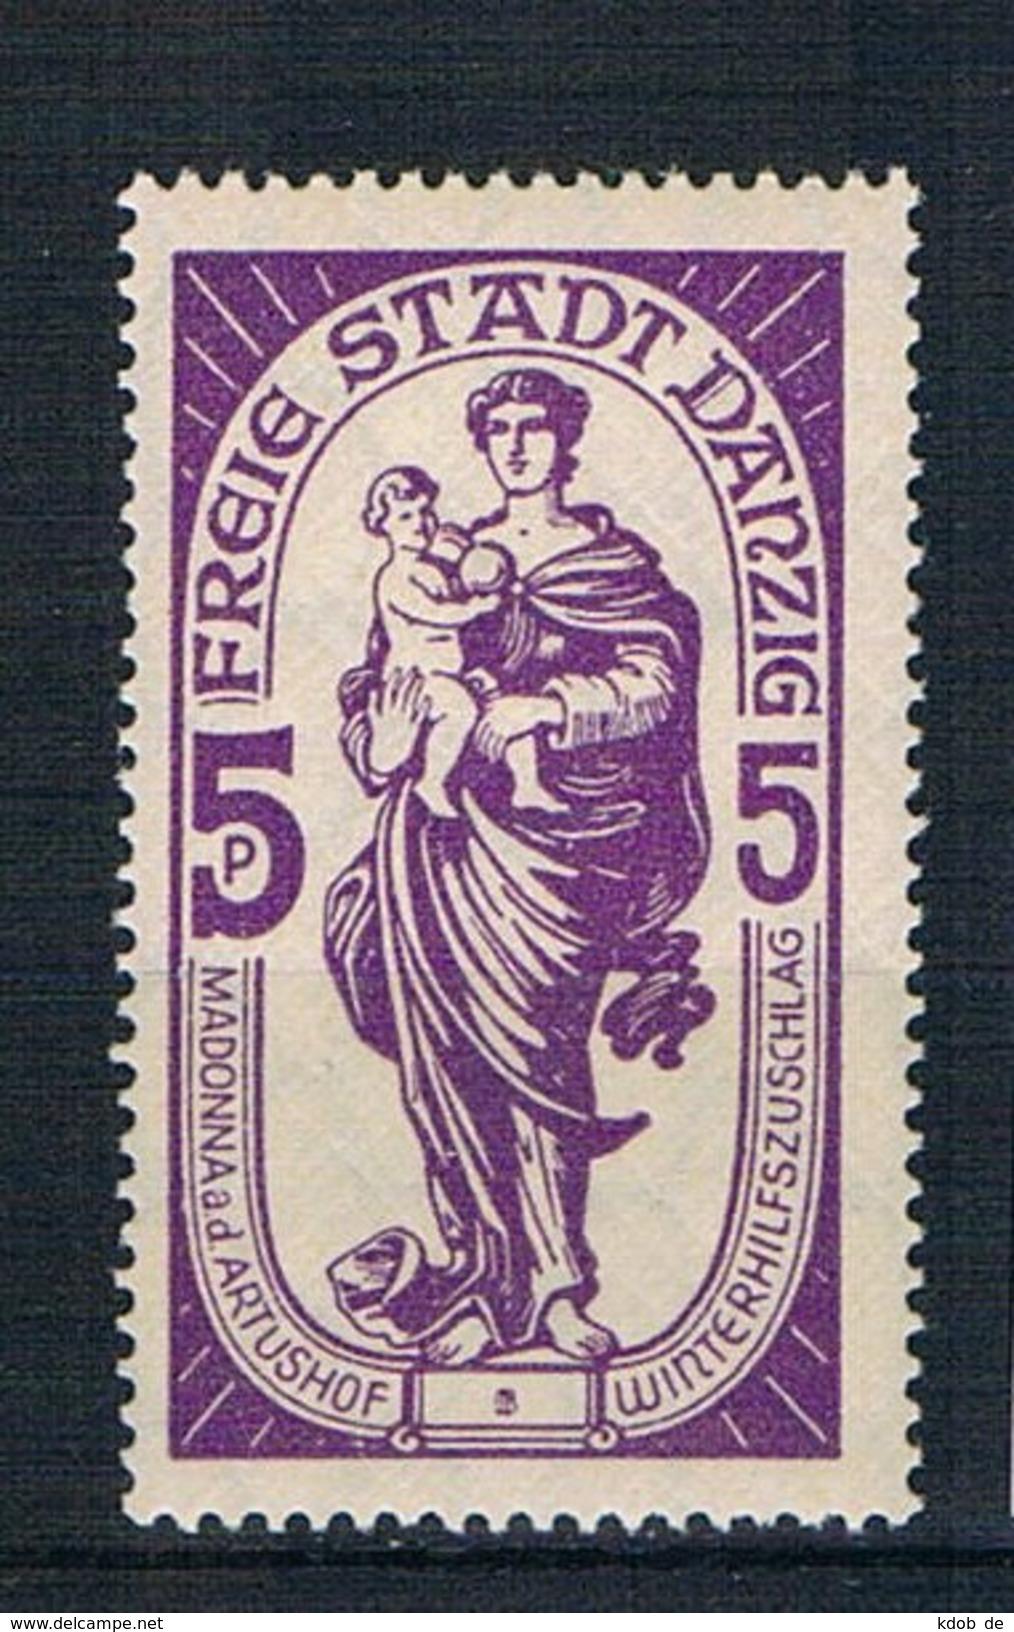 Danzig Michel Nr. 276 Postfrisch - Danzig